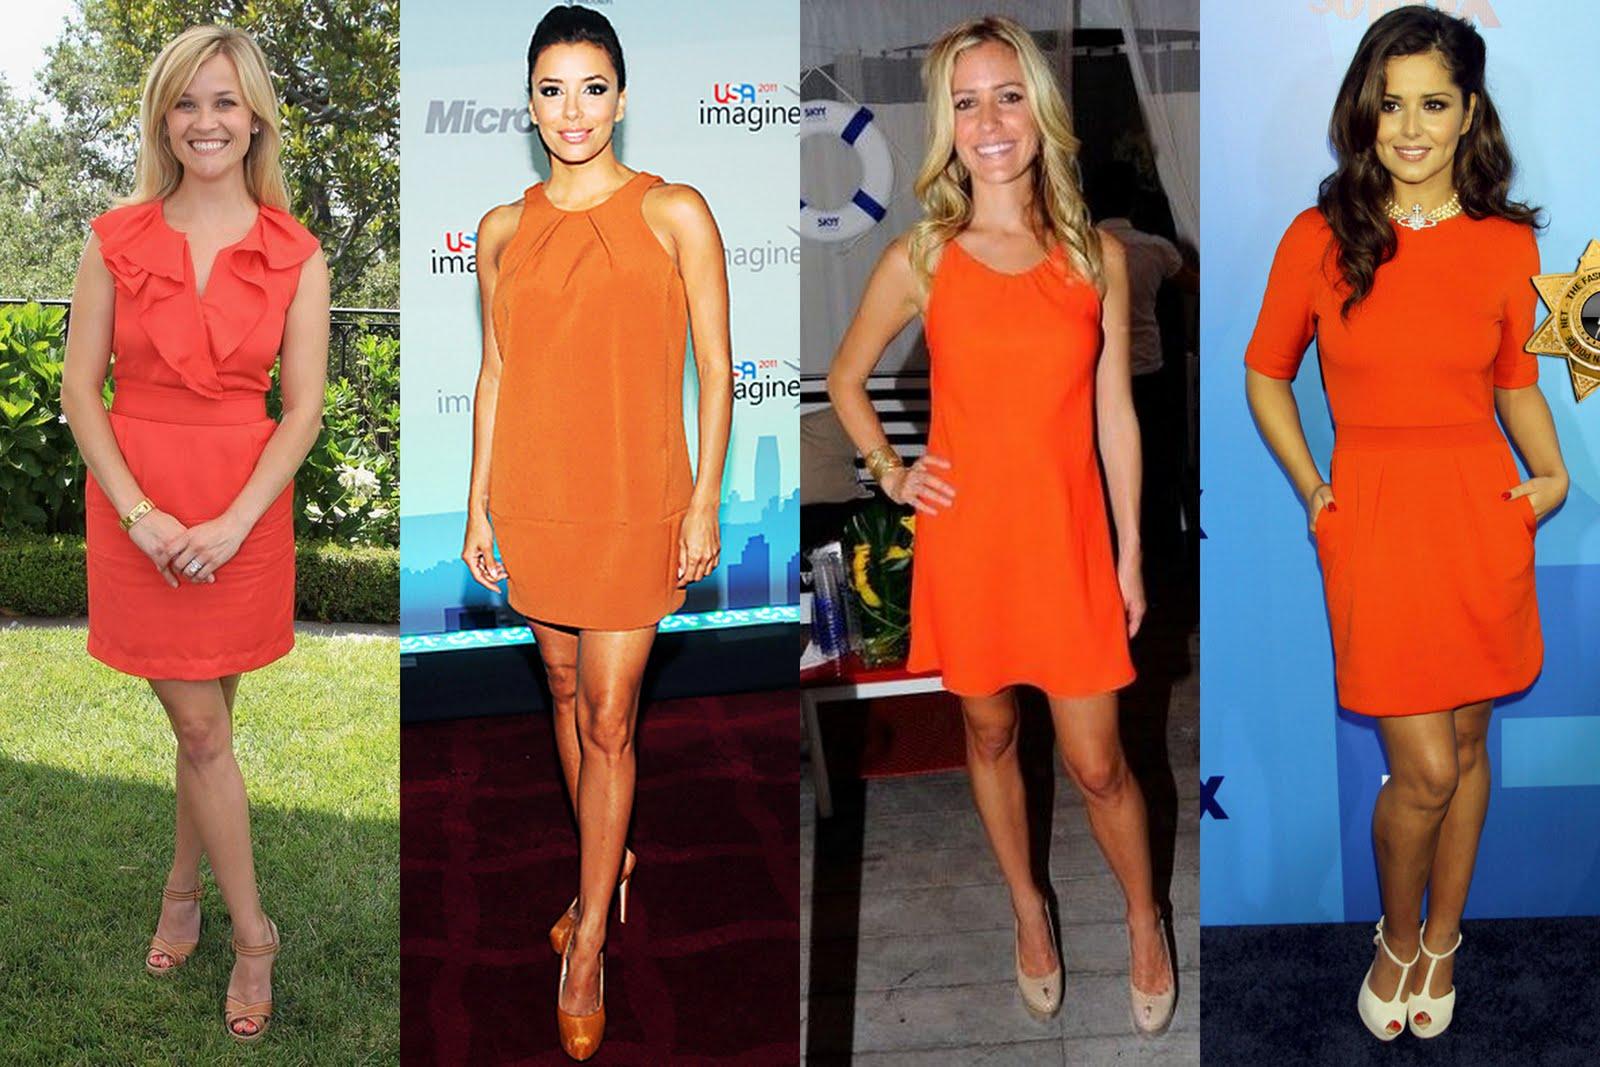 The Orange Dress Trend